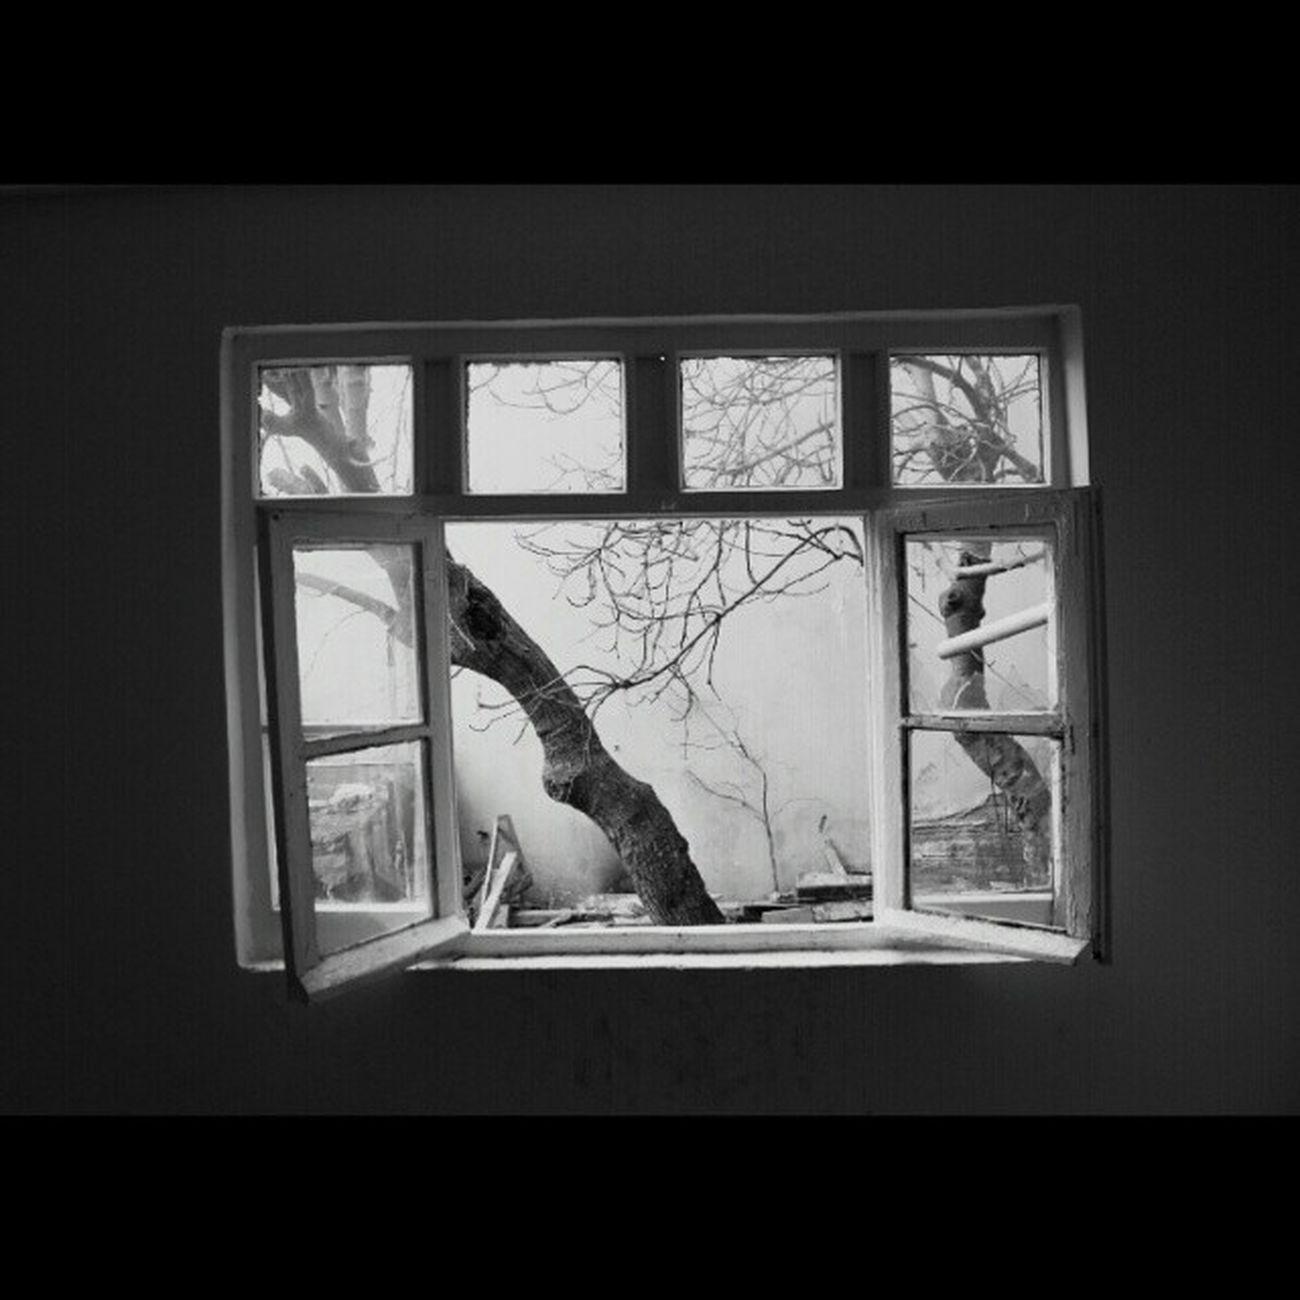 İçeriden... Balat Pencere